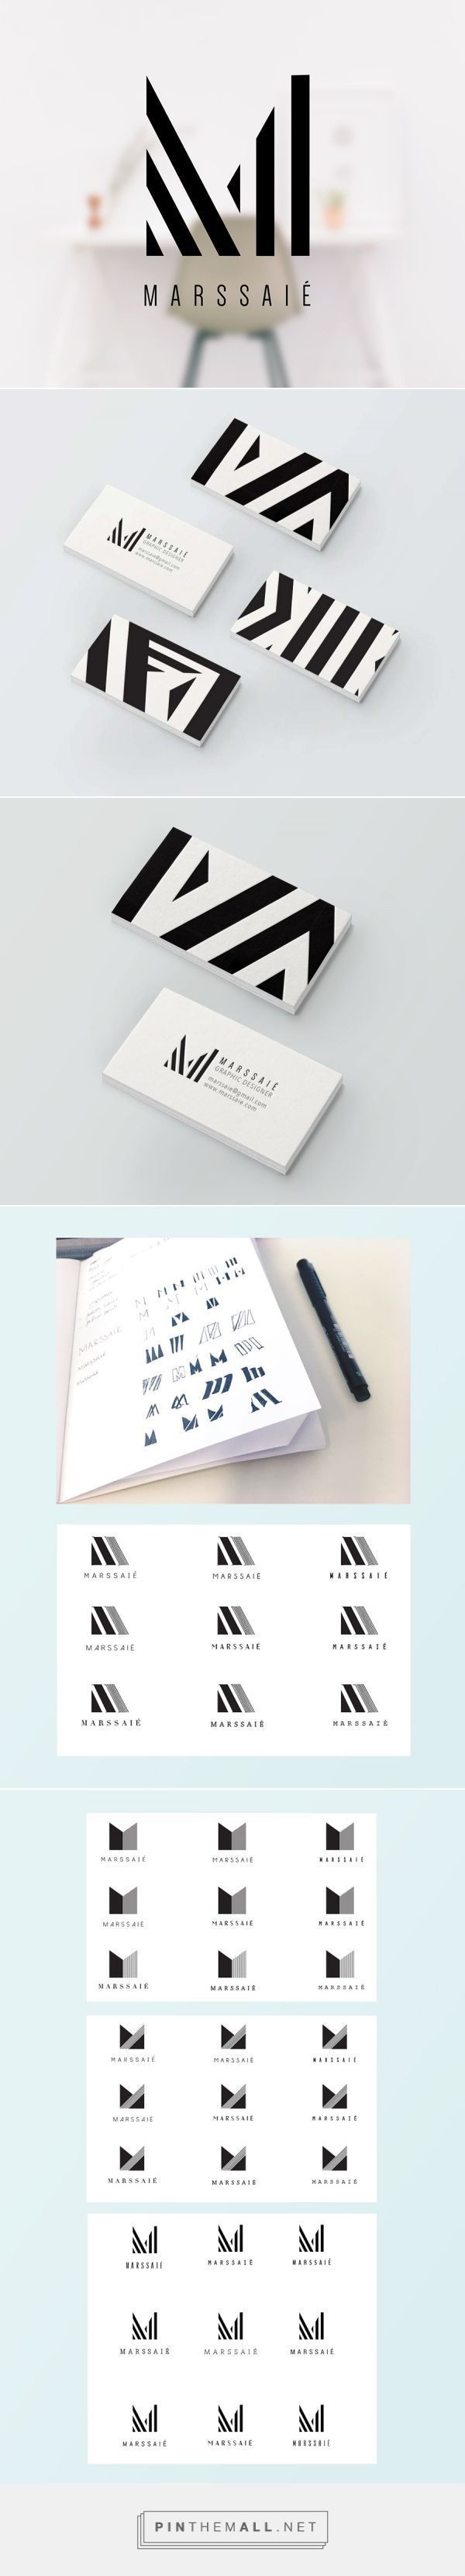 best ideas about logo process bear logo logo marssaieacute personal identity graphic designer visual identity marssaie